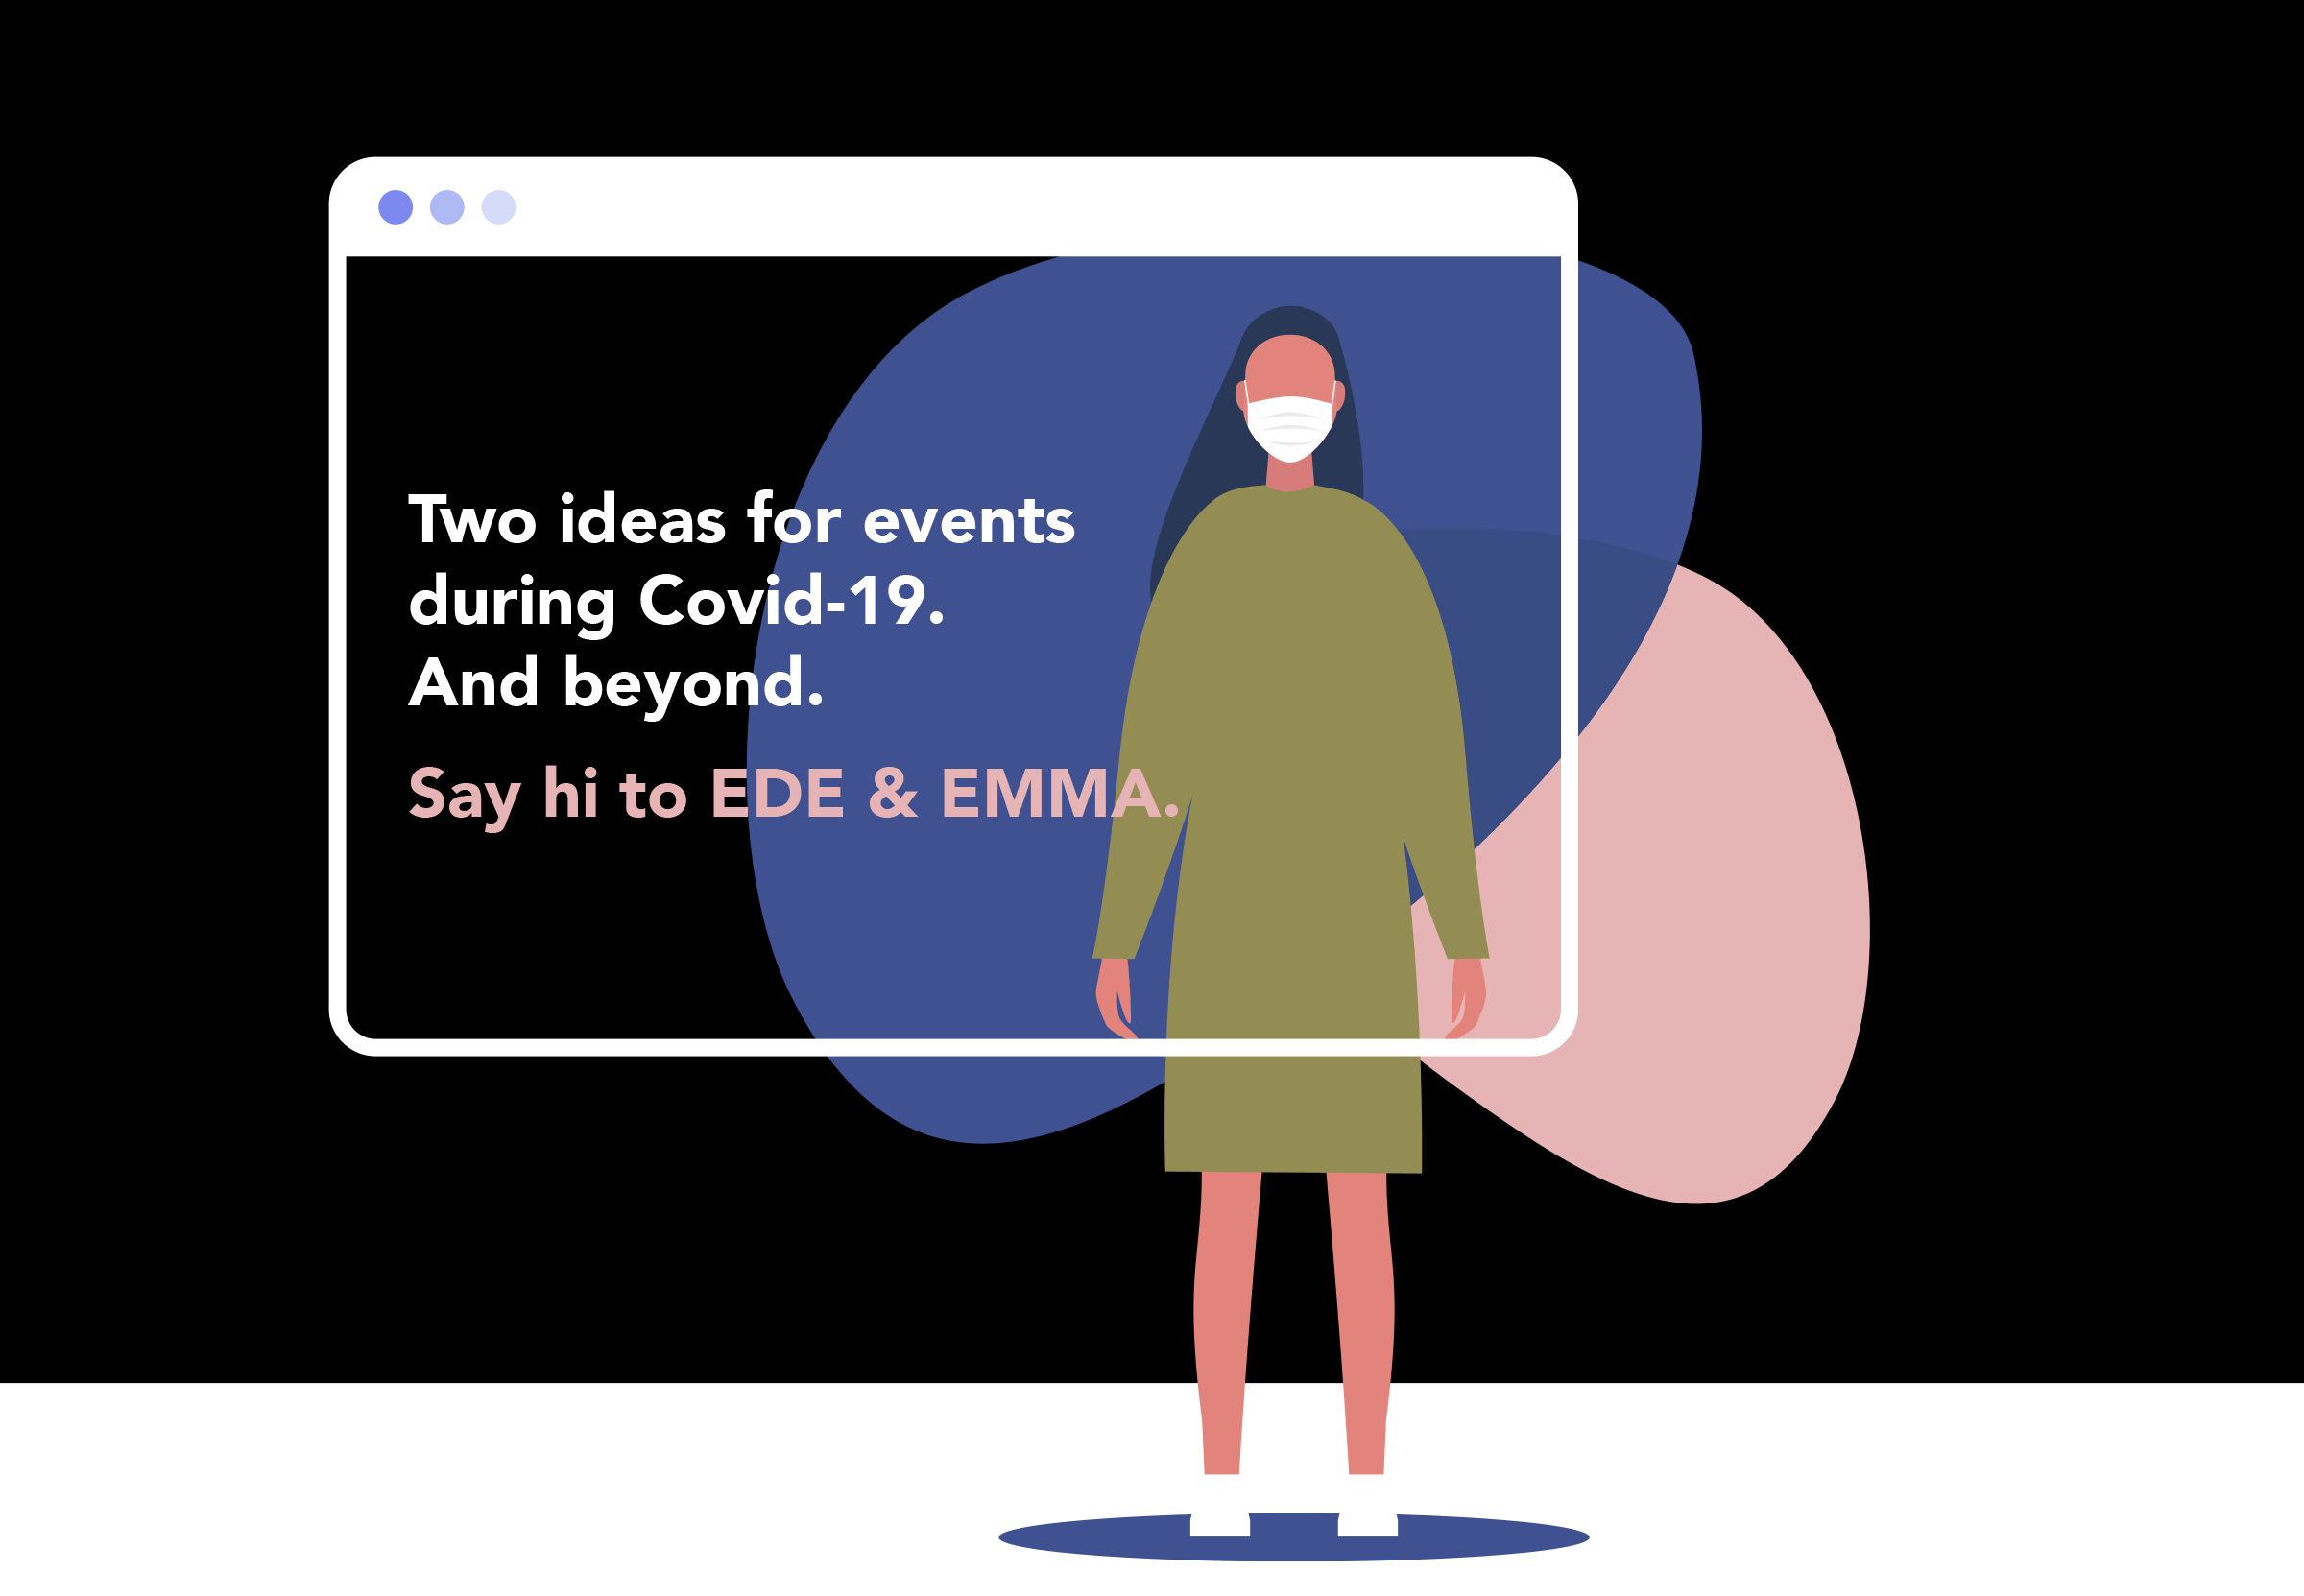 ede-emma-1